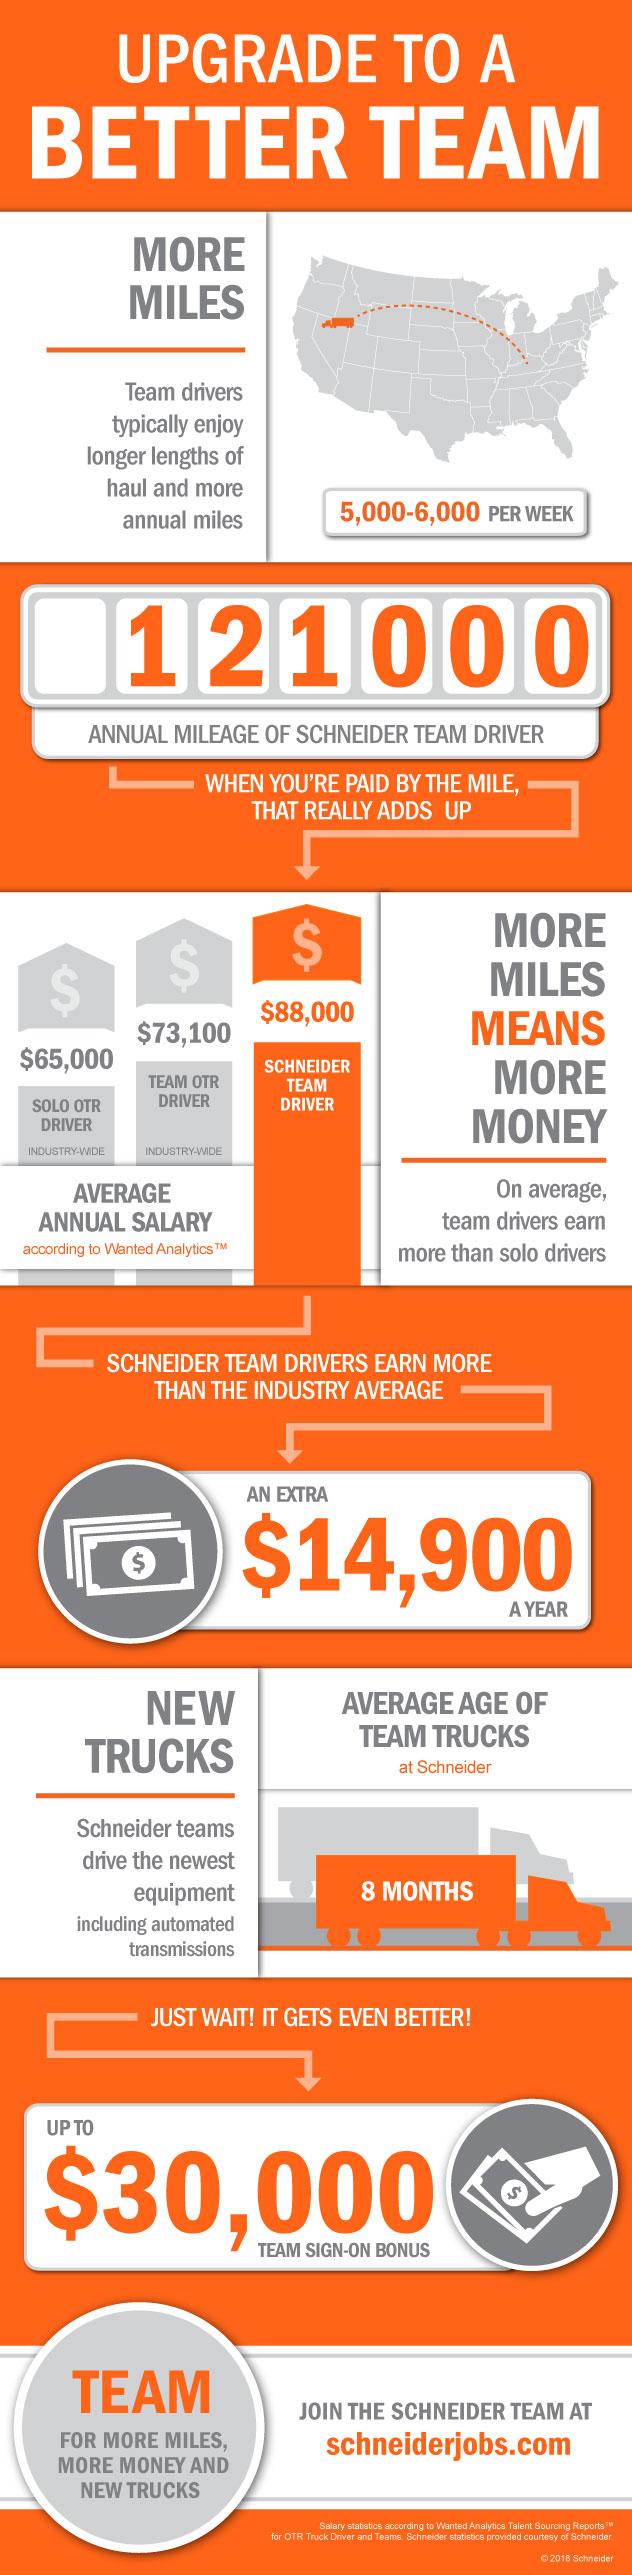 Team Truck Driving Jobs offer sign-on bonus, Van Driving Jobs